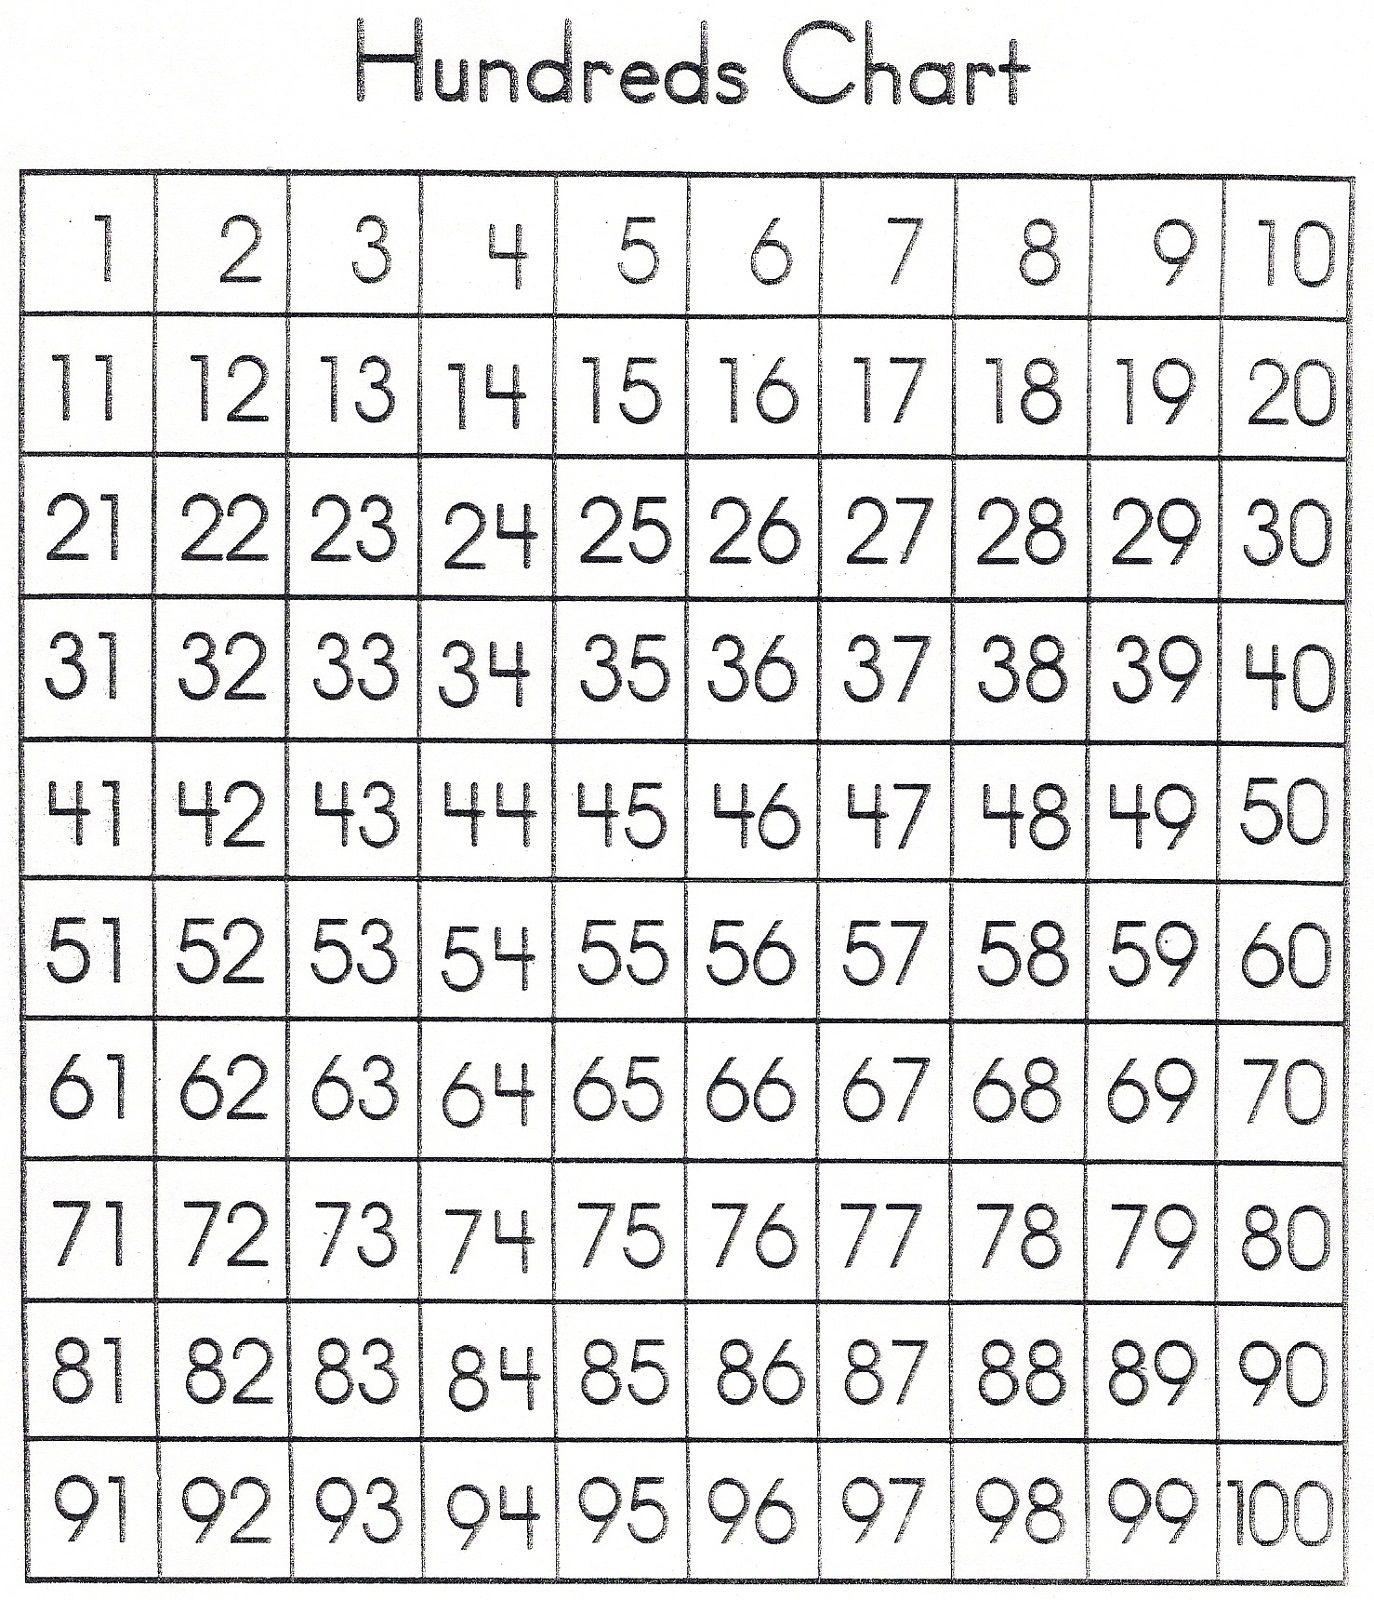 Number Sheet 1-100 To Print   Math Worksheets For Kids   100 Number - Free Printable Hundreds Chart